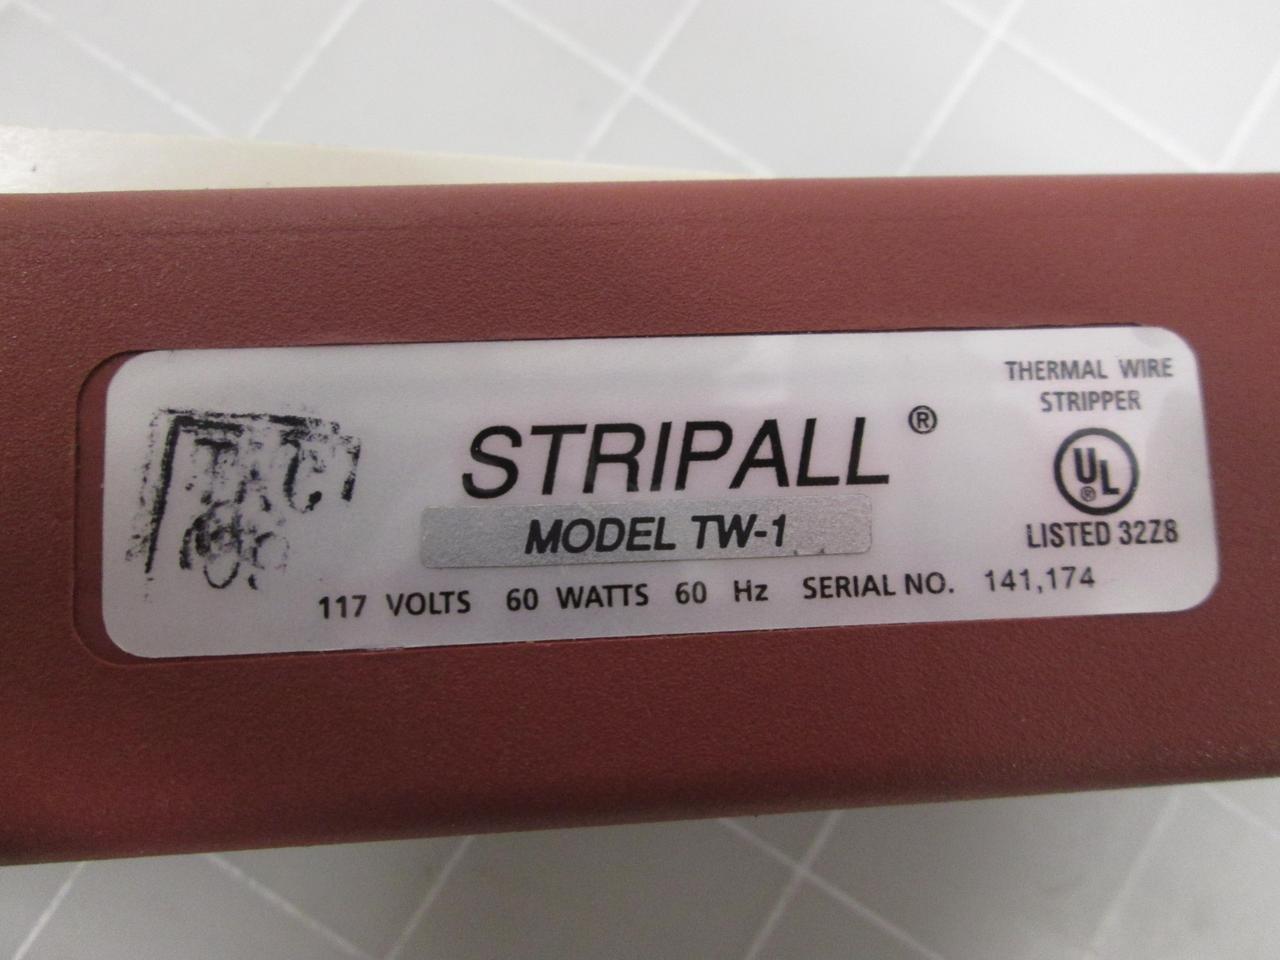 Teledyne Thermal Wire Stripper Stripall Plus, TW-1, 117v AC ...